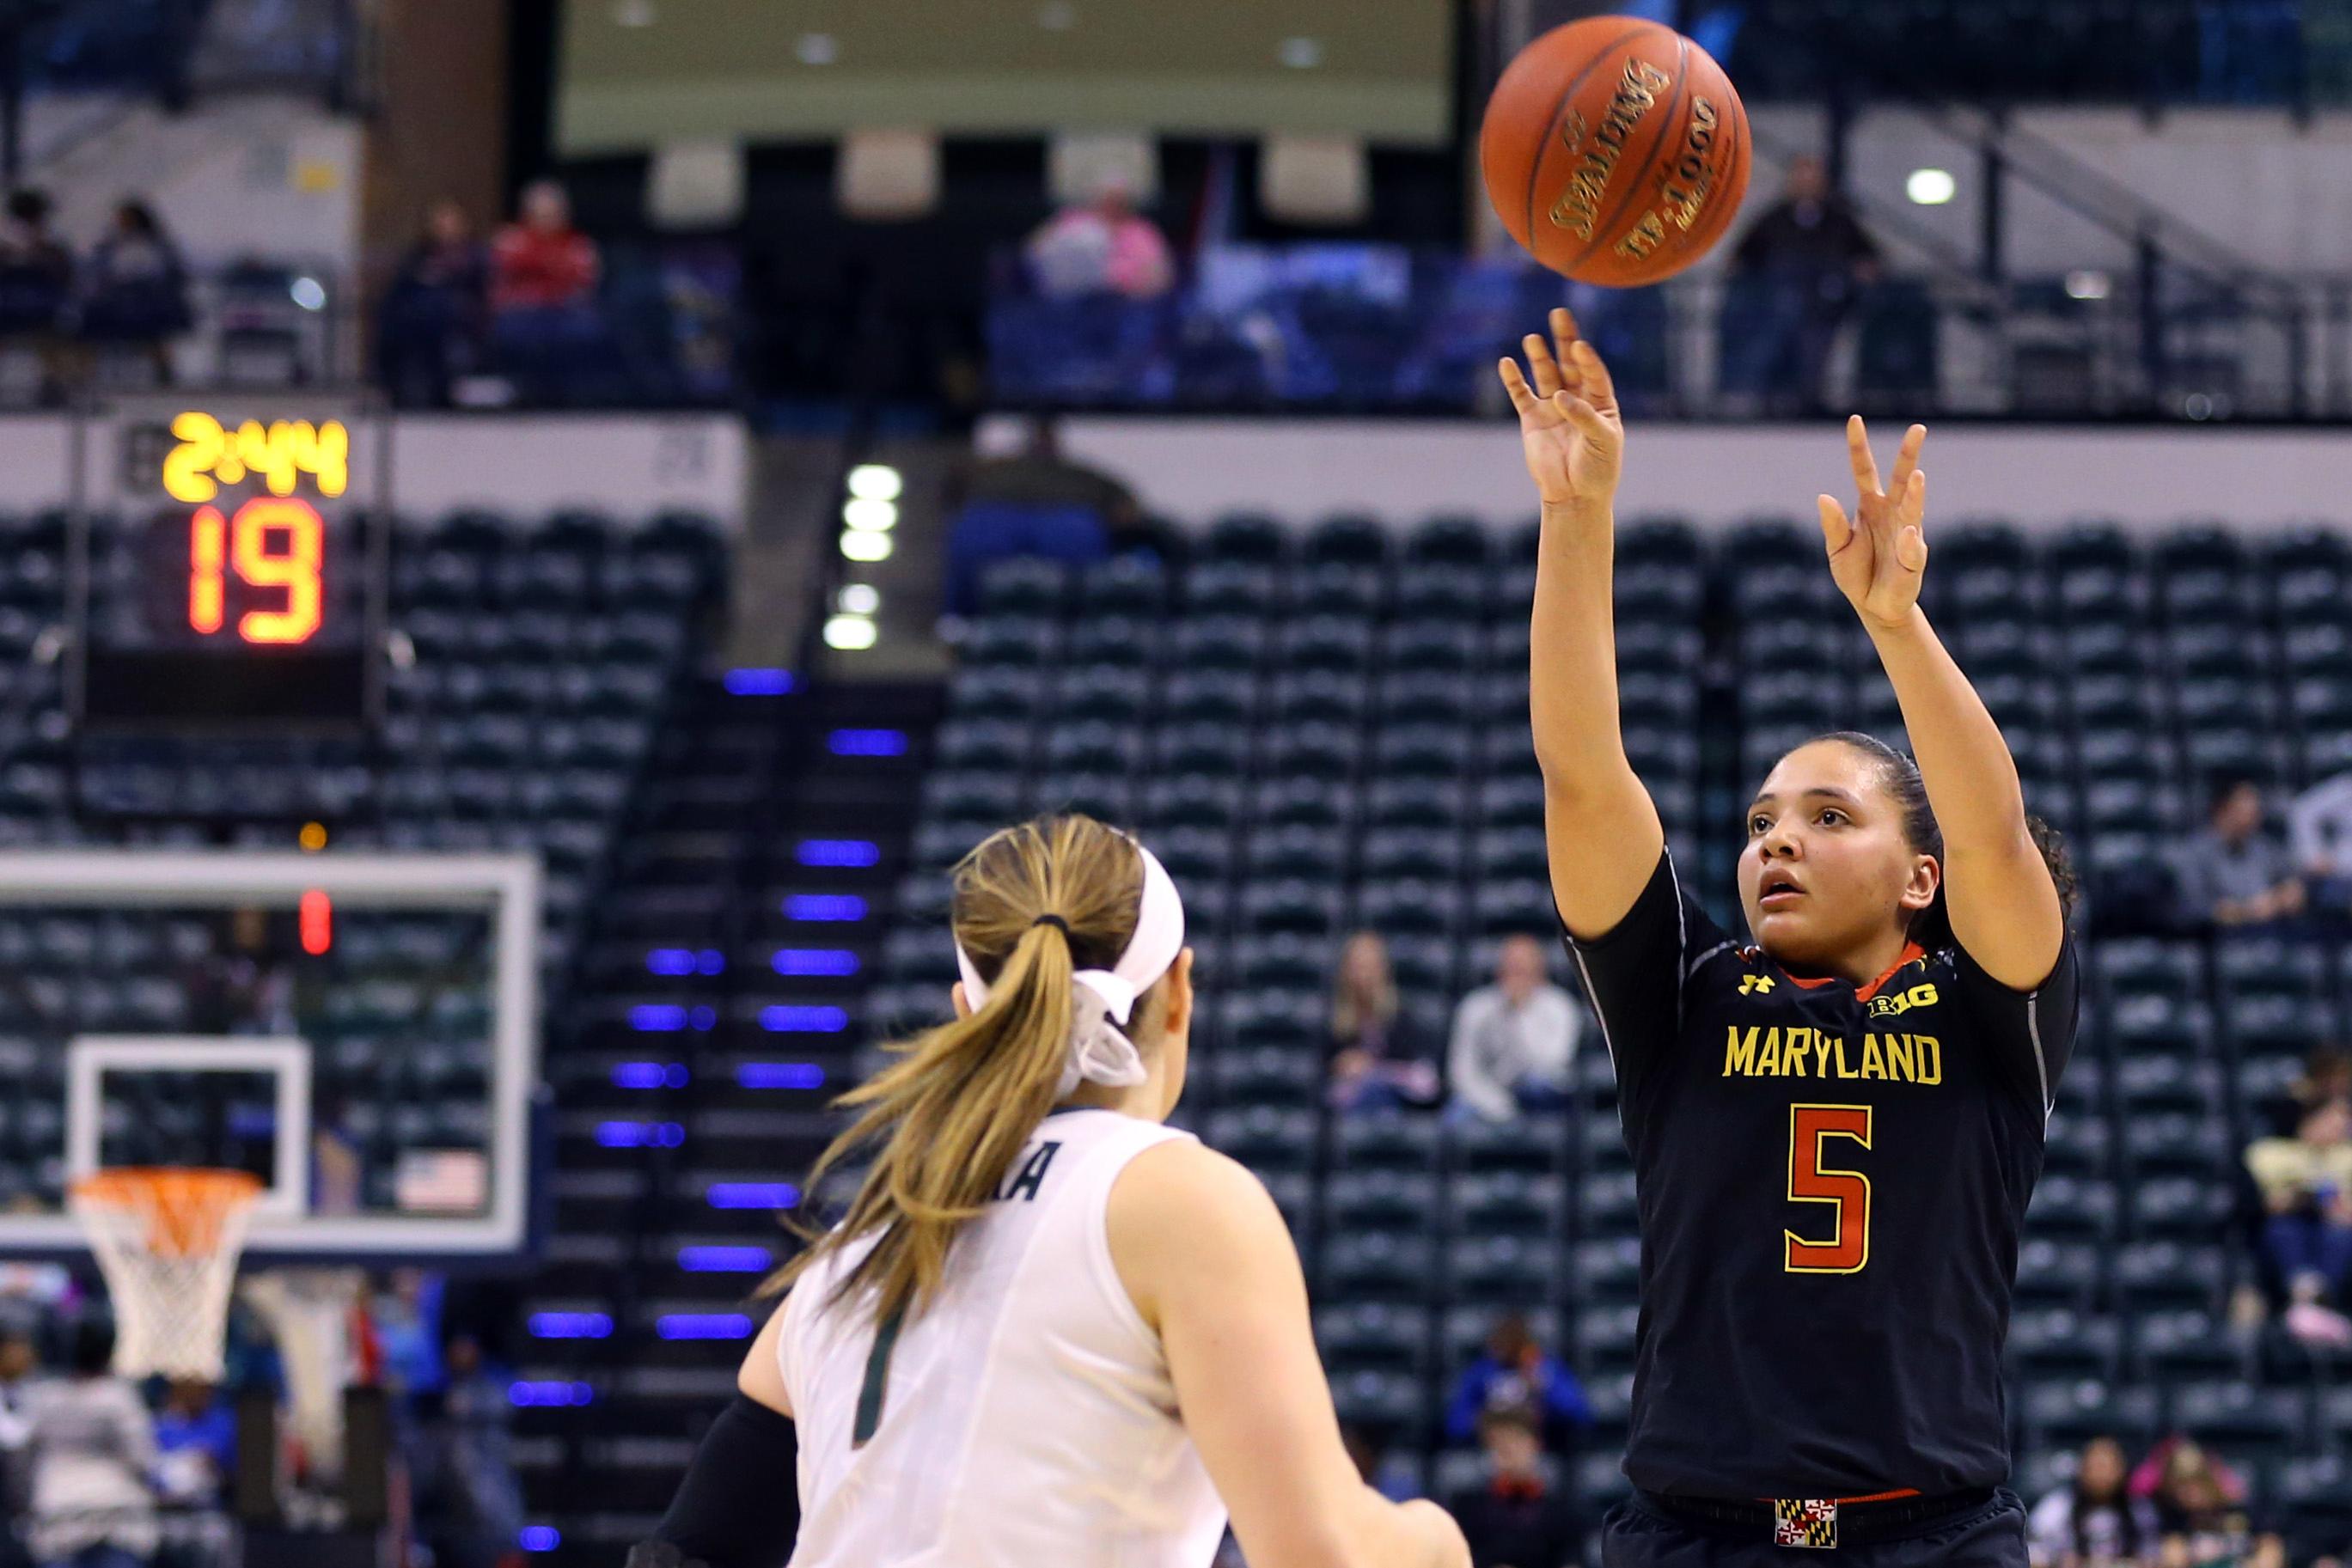 Maryland Women's Basketball - Testudo Times